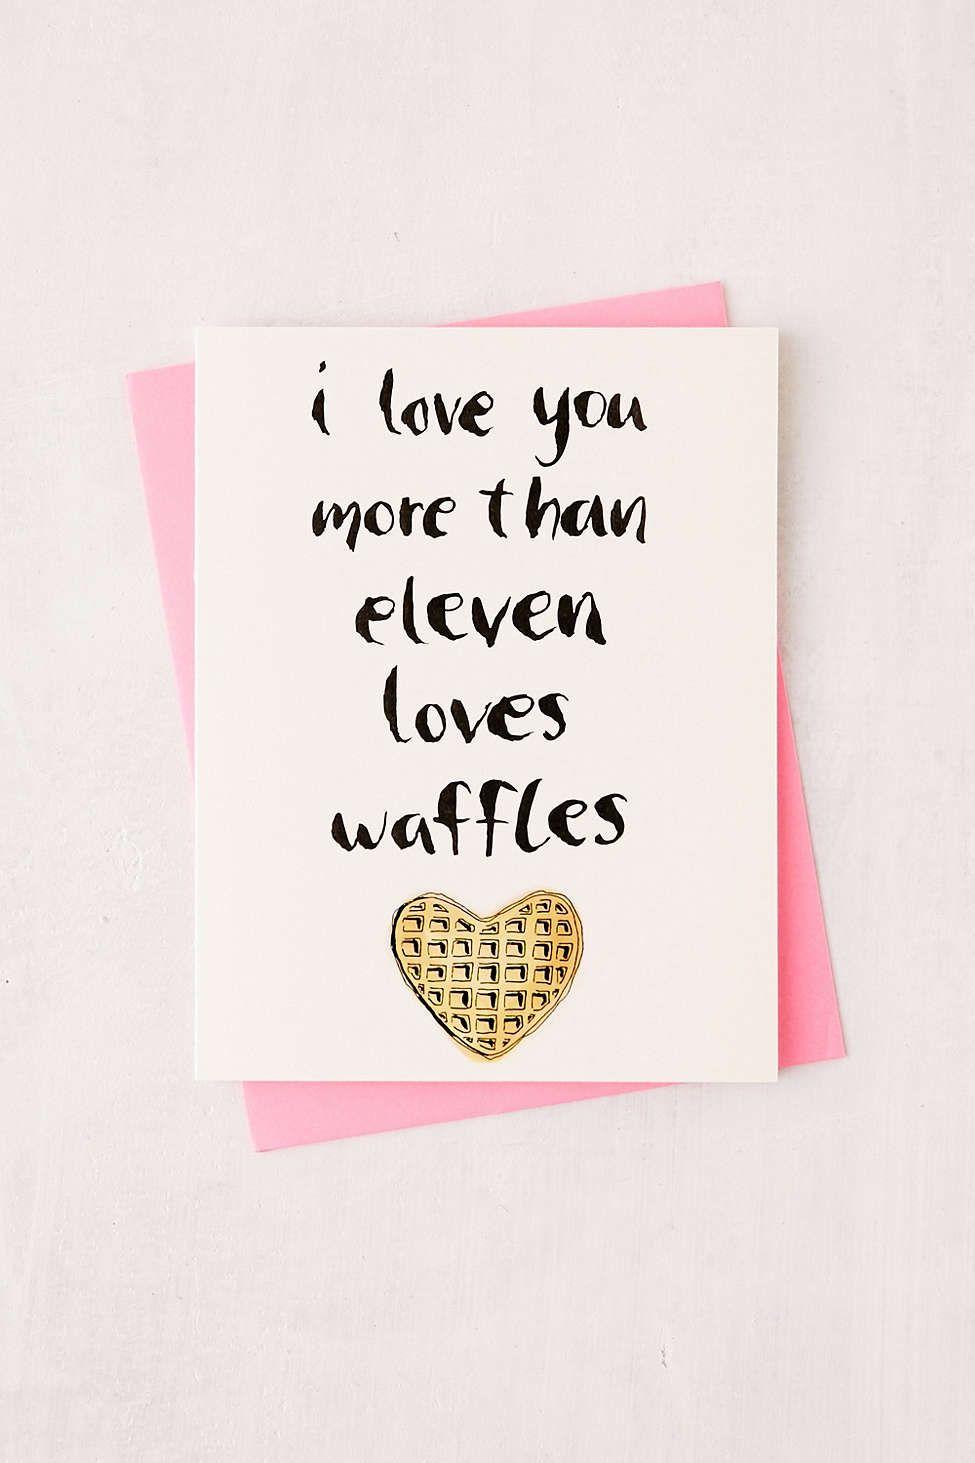 Aspen vanhooser love waffles greeting card holiday pinterest aspen vanhooser love waffles greeting card kristyandbryce Image collections